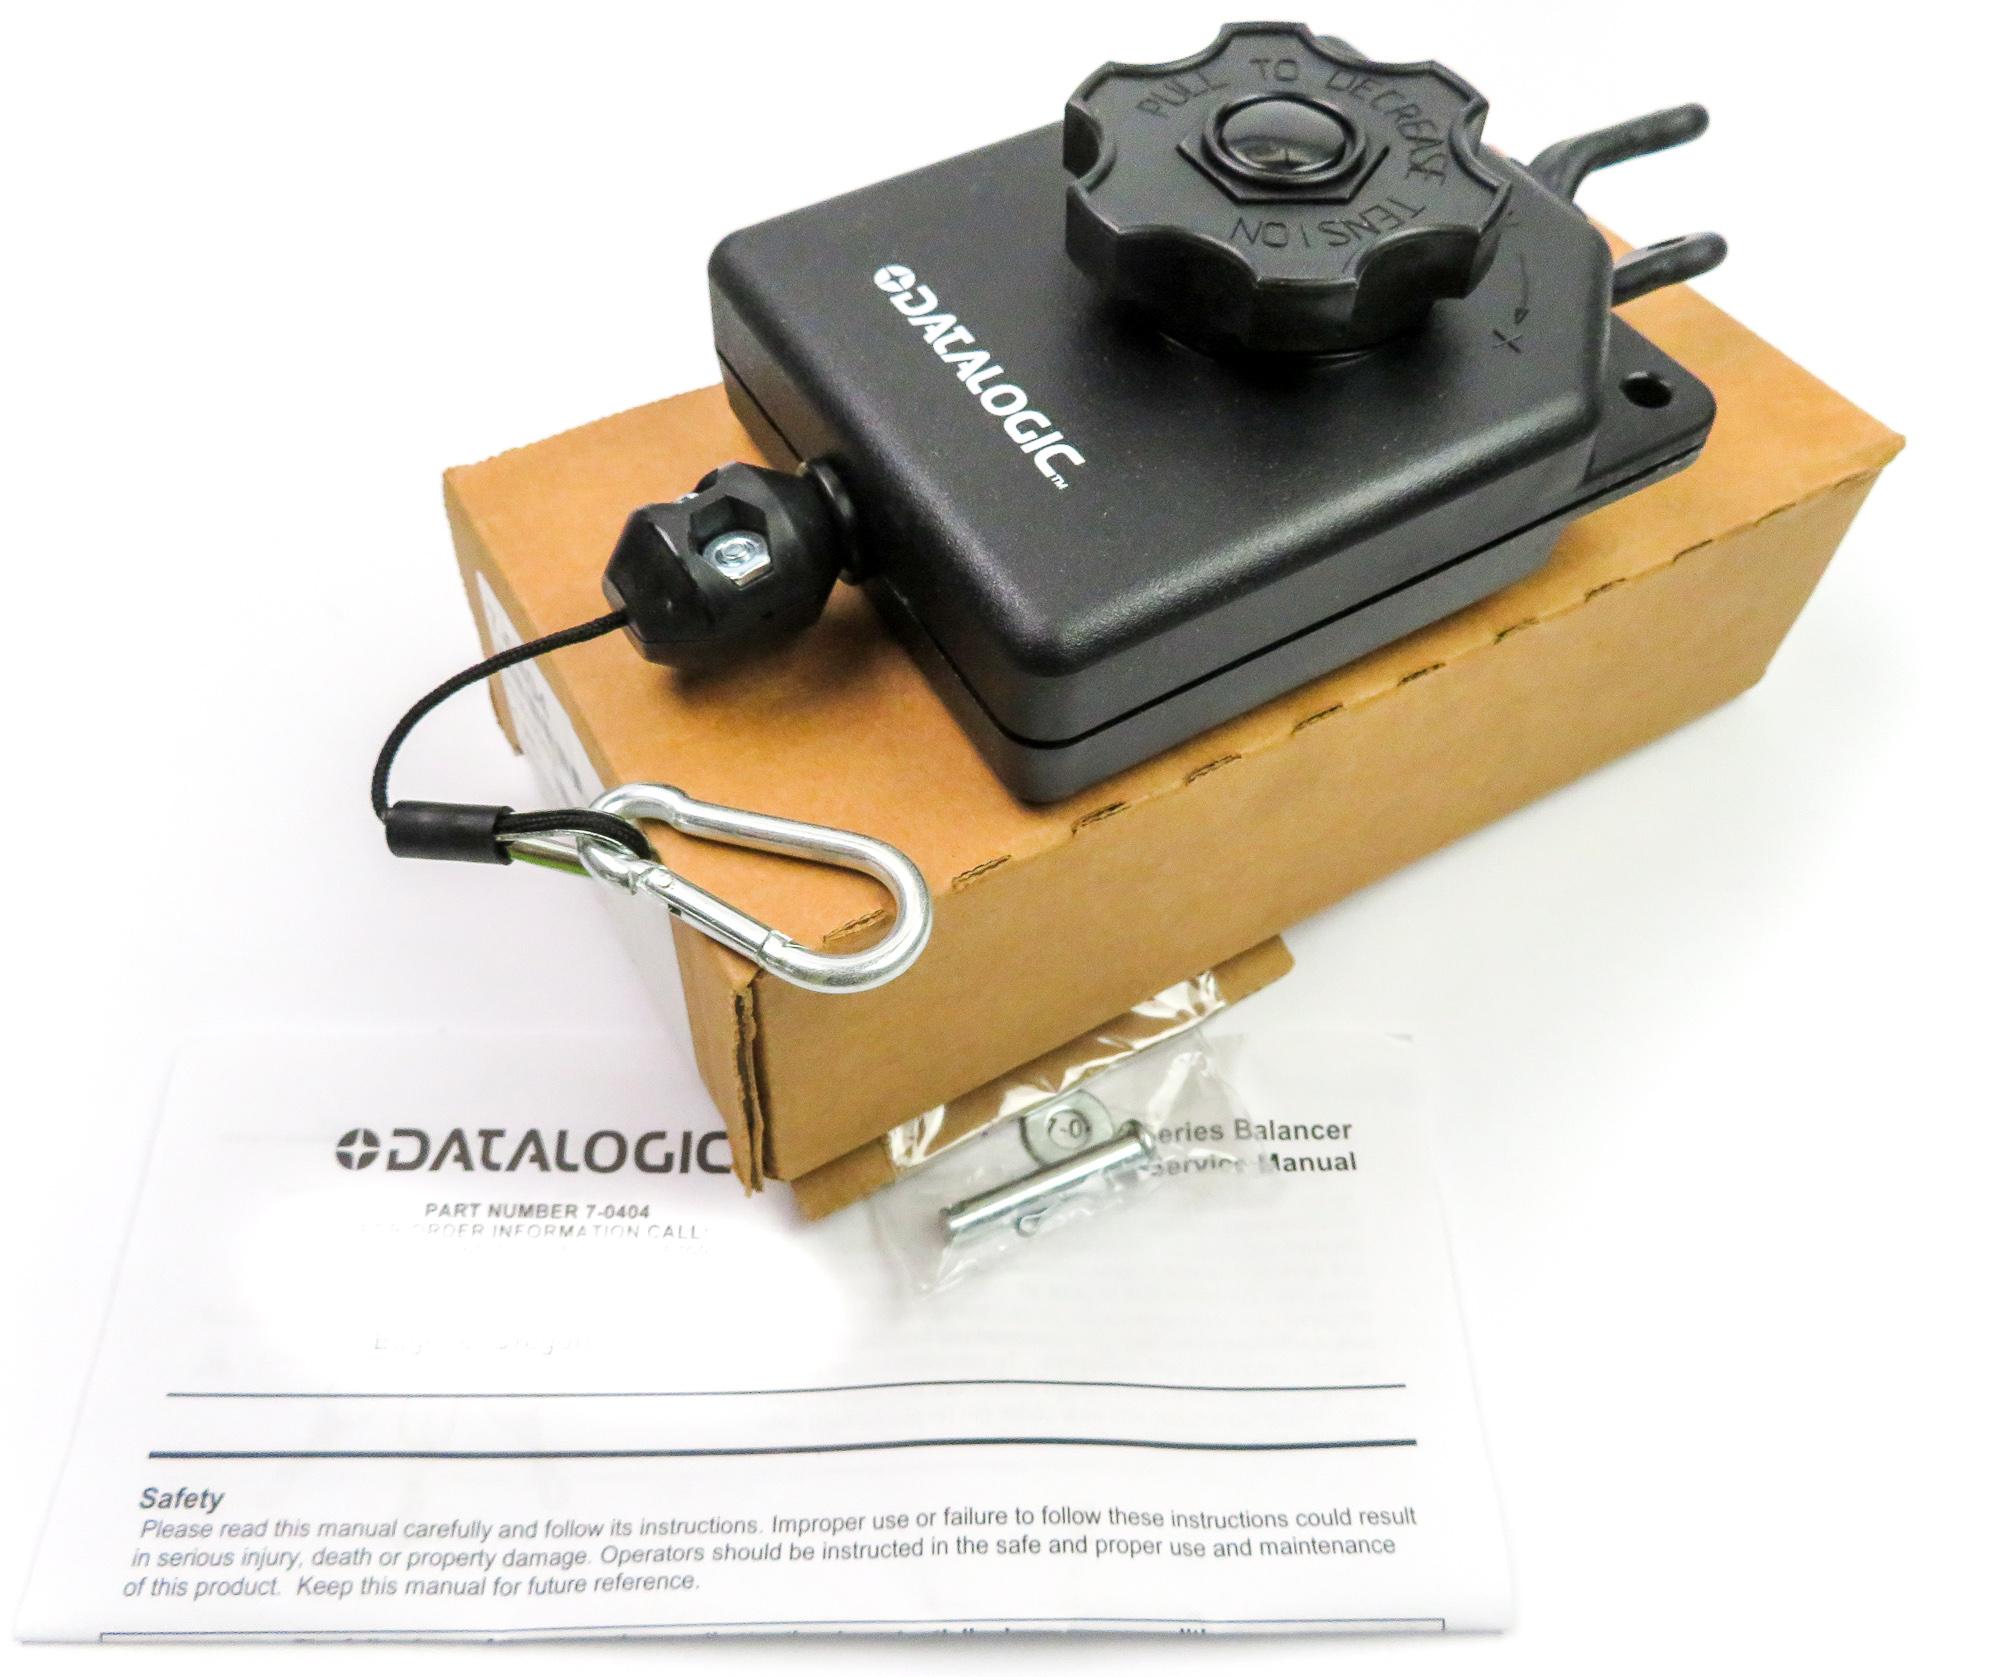 *New* Datalogic 7-0404 Series Balancer Industrial Take-Up Reel